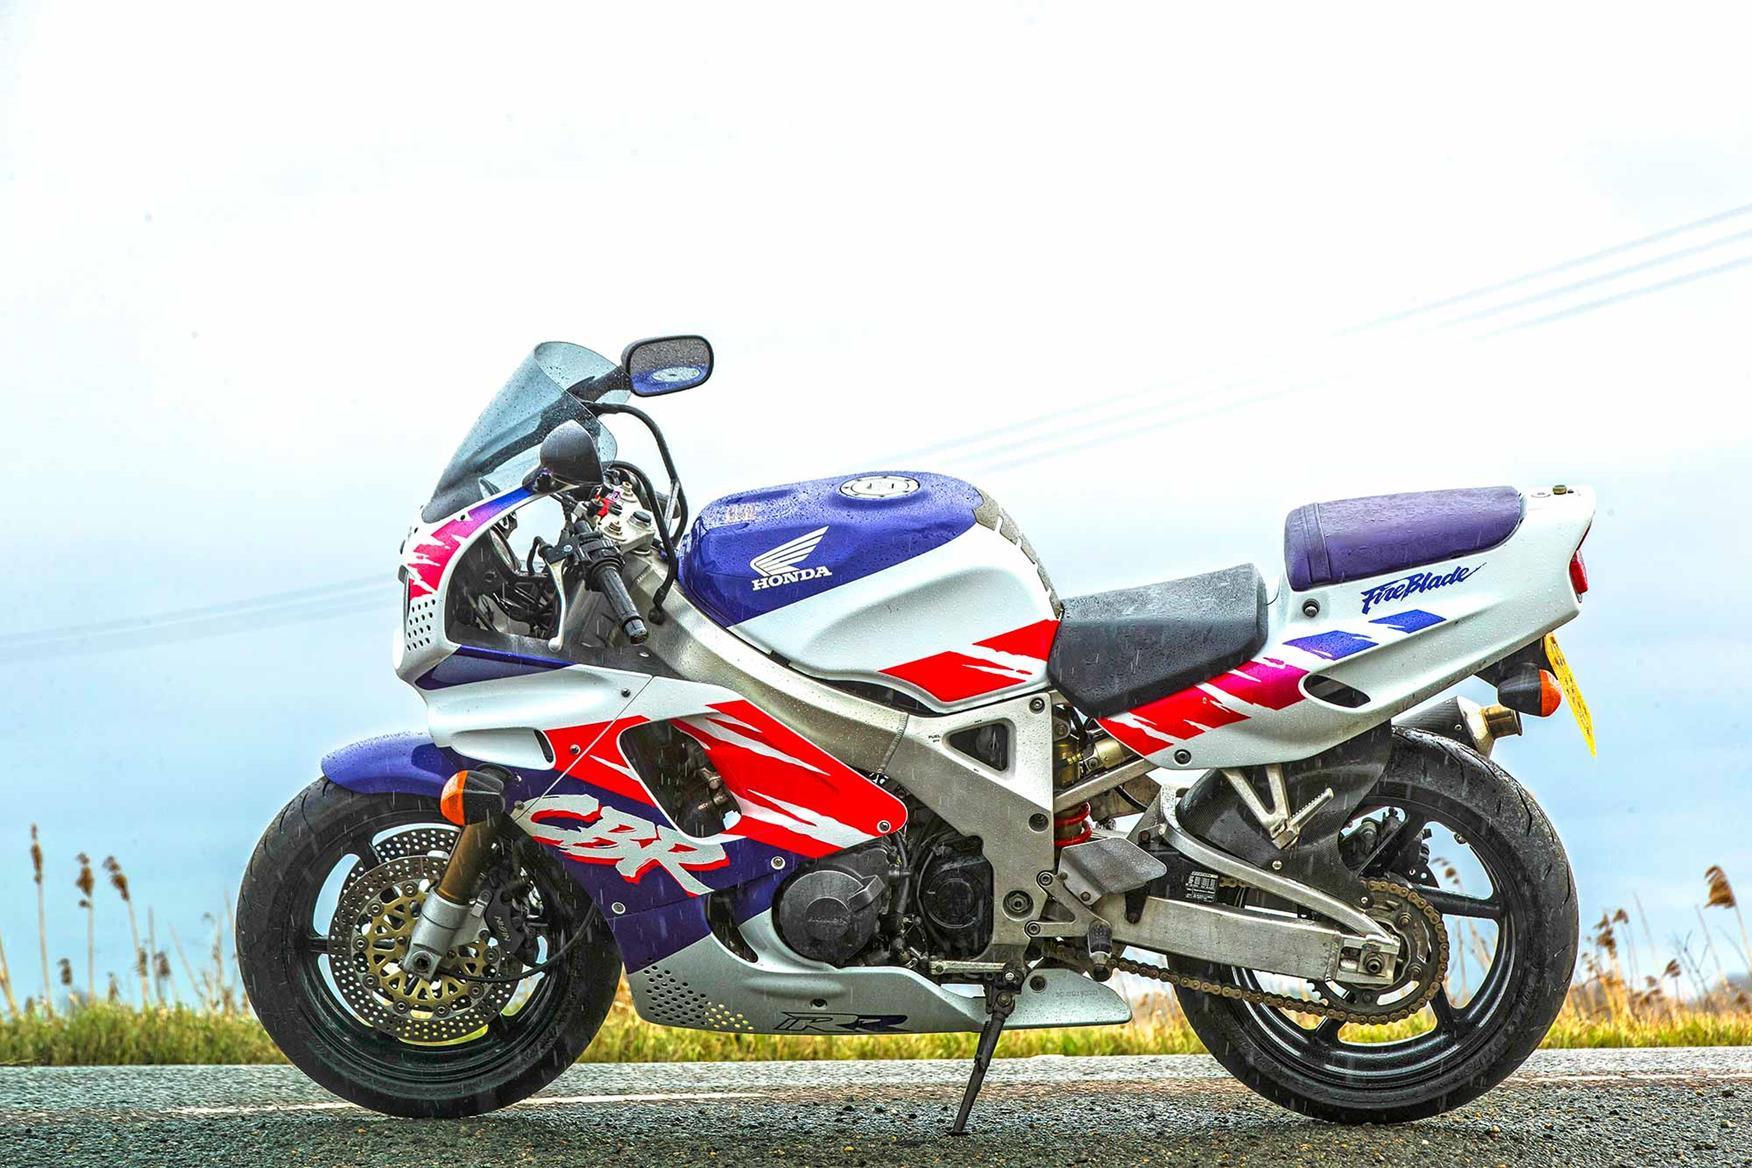 The Honda CBR900RR FireBlade